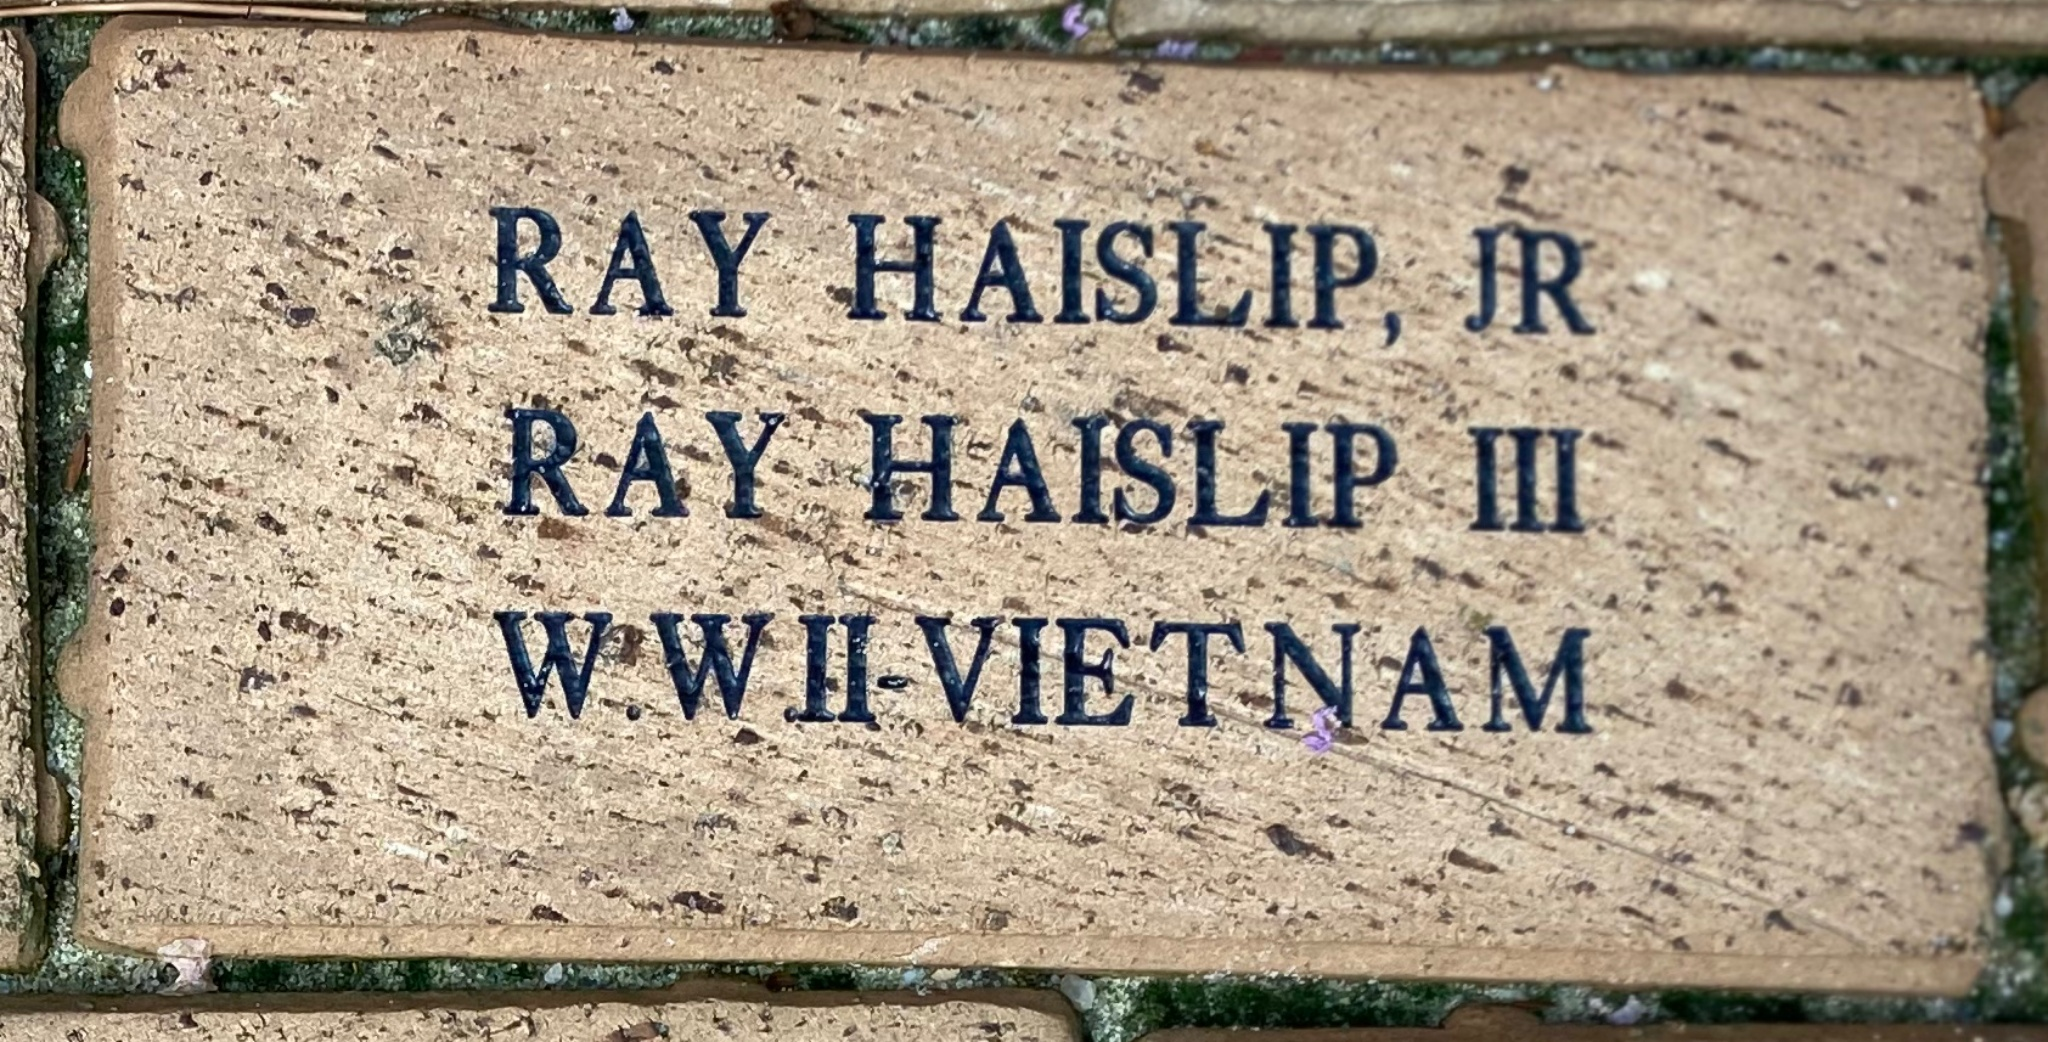 RAY HAISLIP, JR. RAY HAISLIP III WWII-VIETNAM